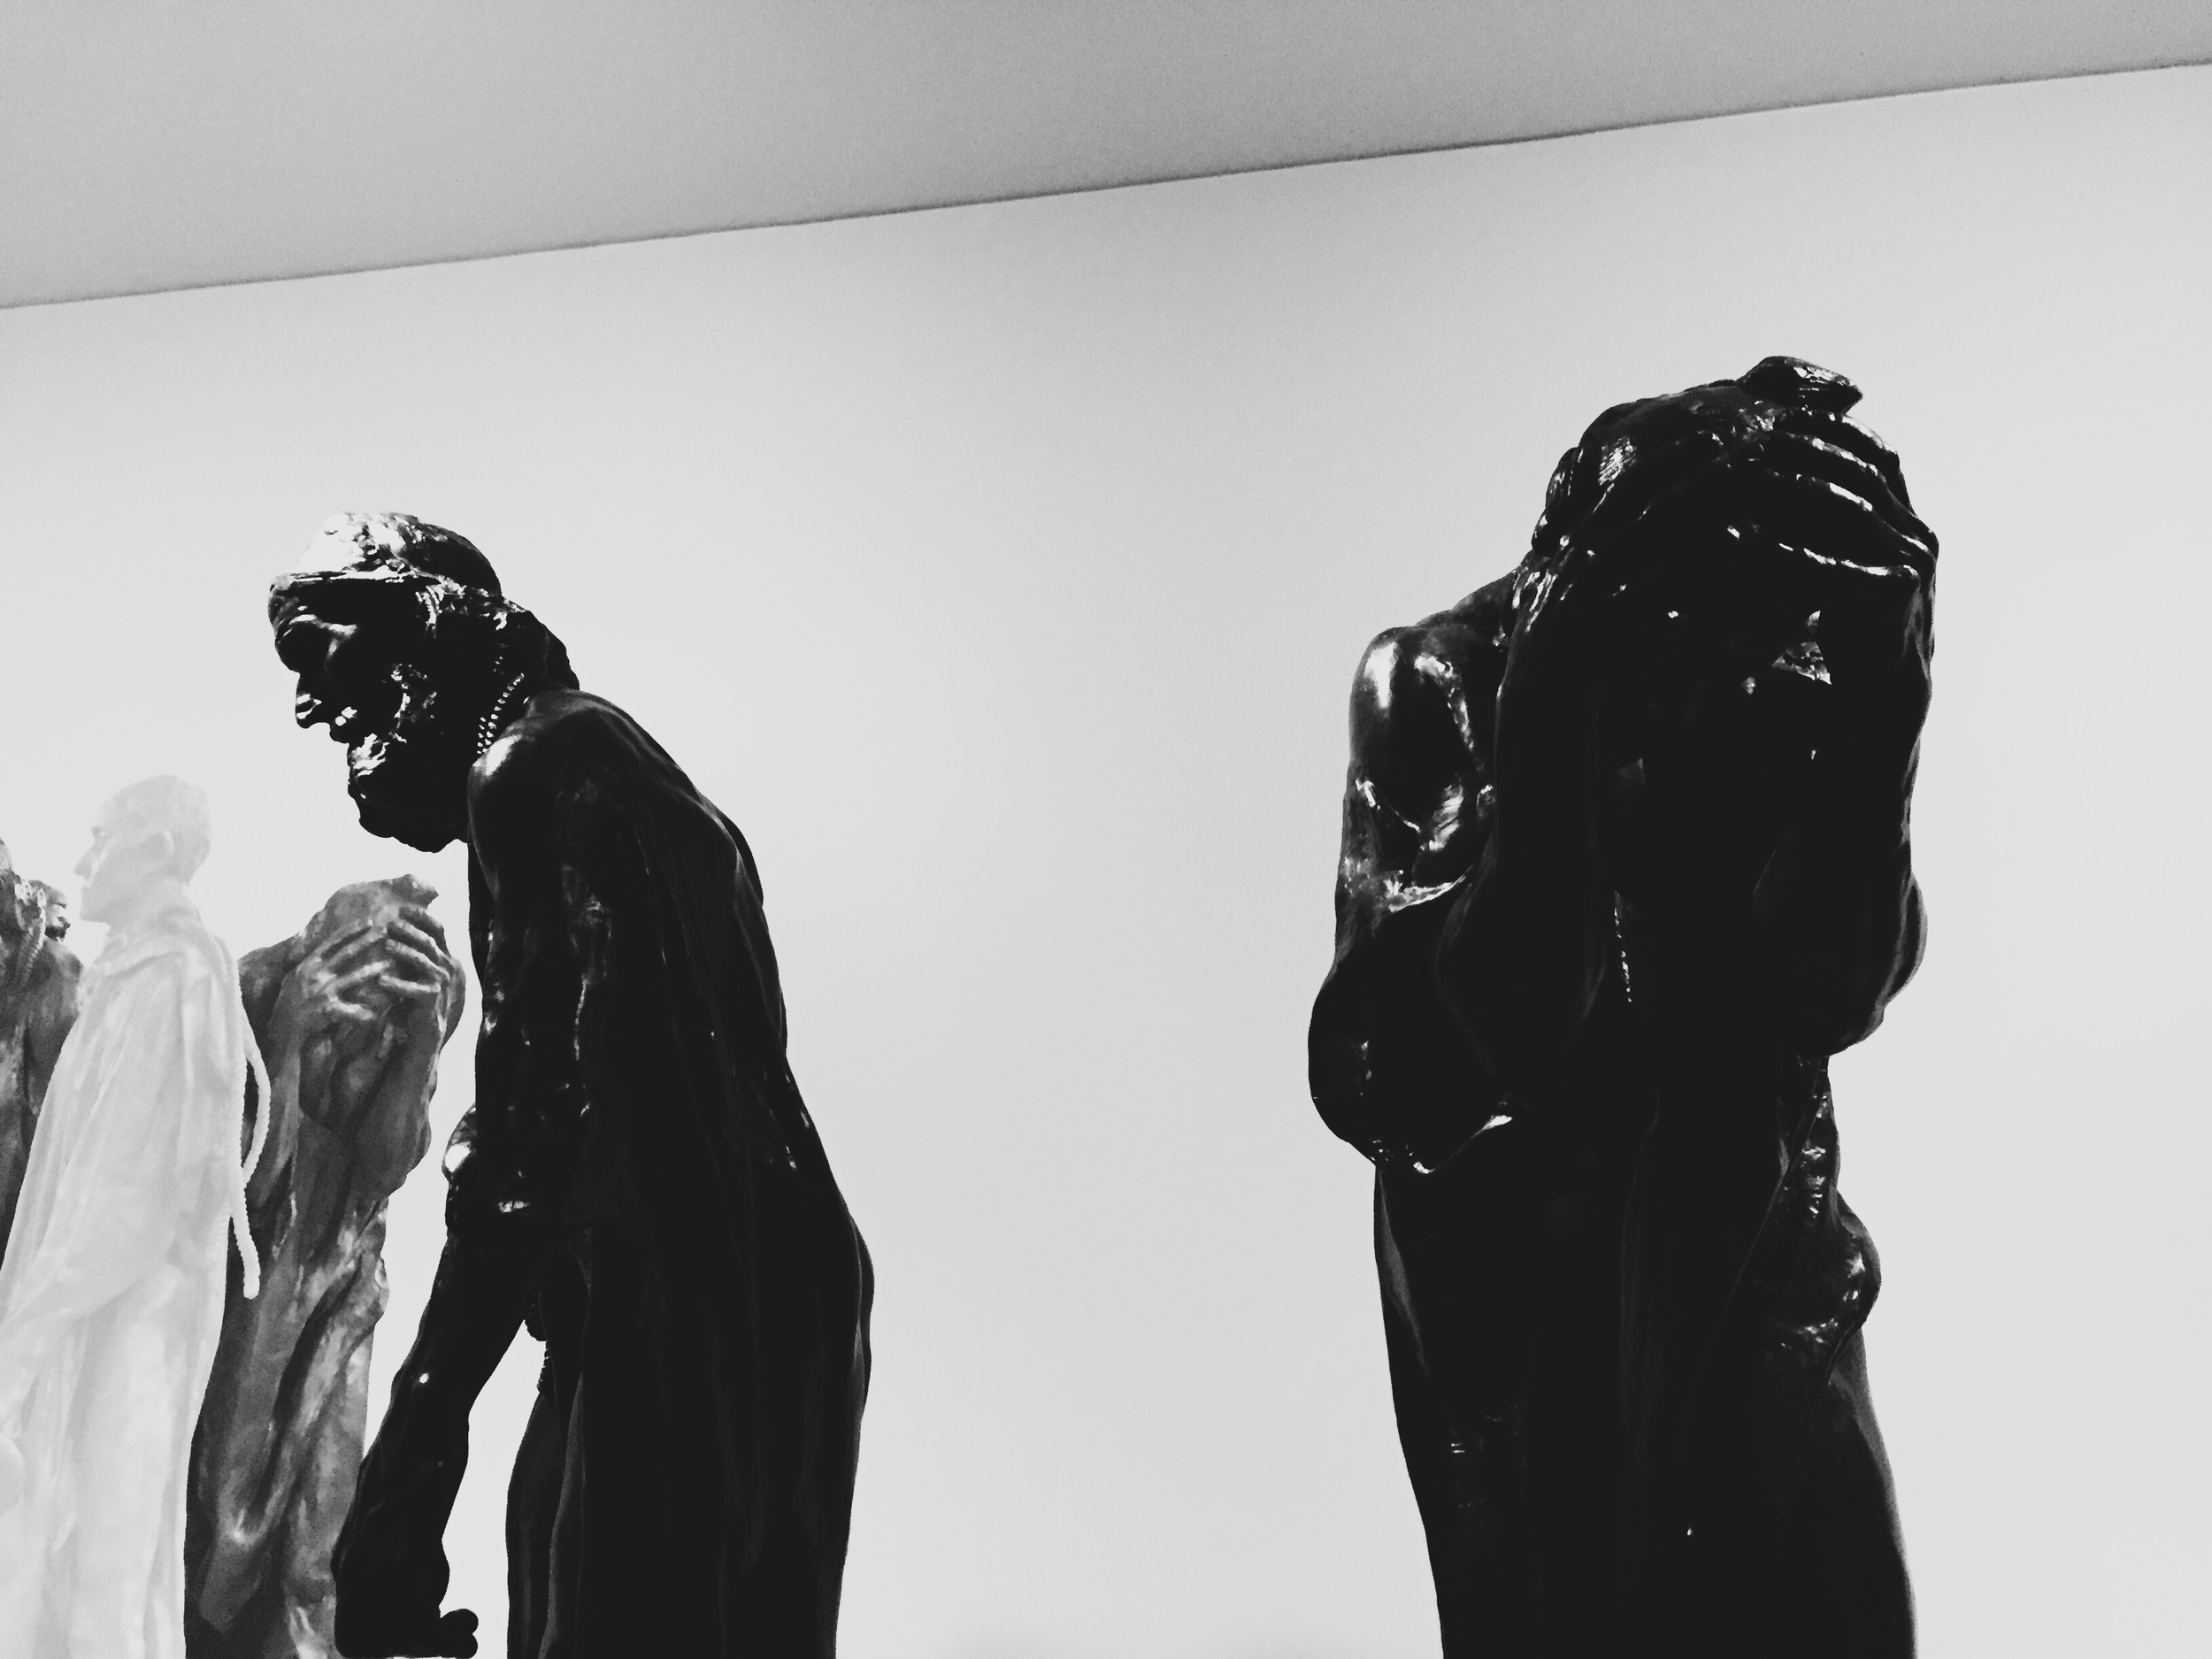 The Michelangelo: Quest for Geniusexhibit at the AGO.